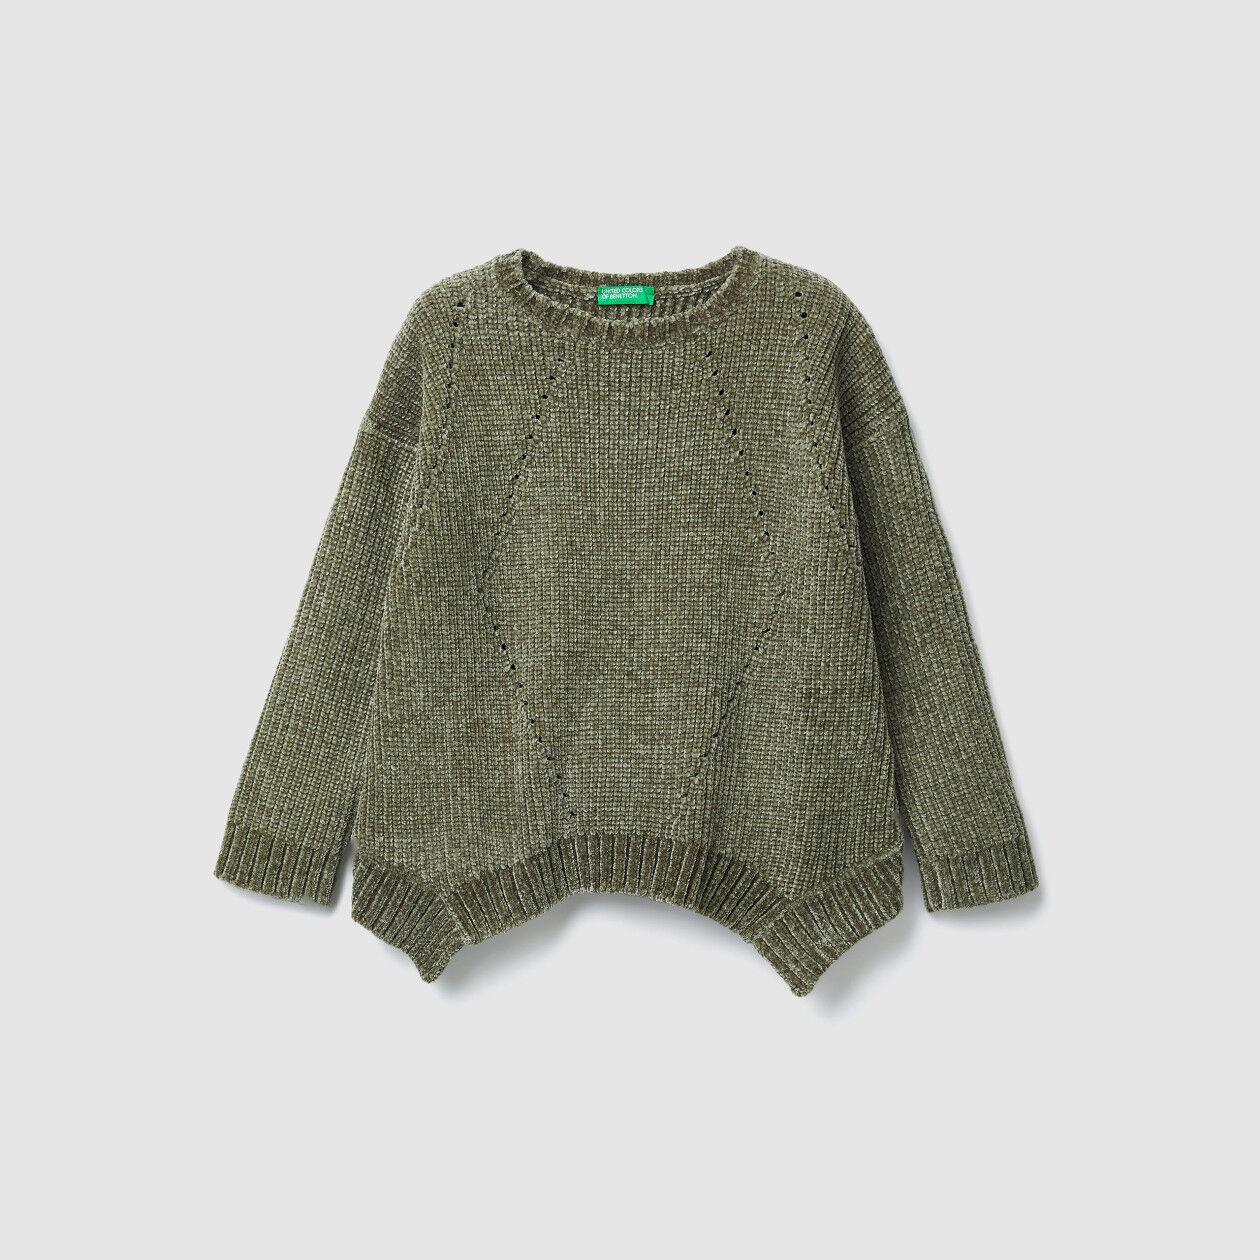 Uneven chenille sweater